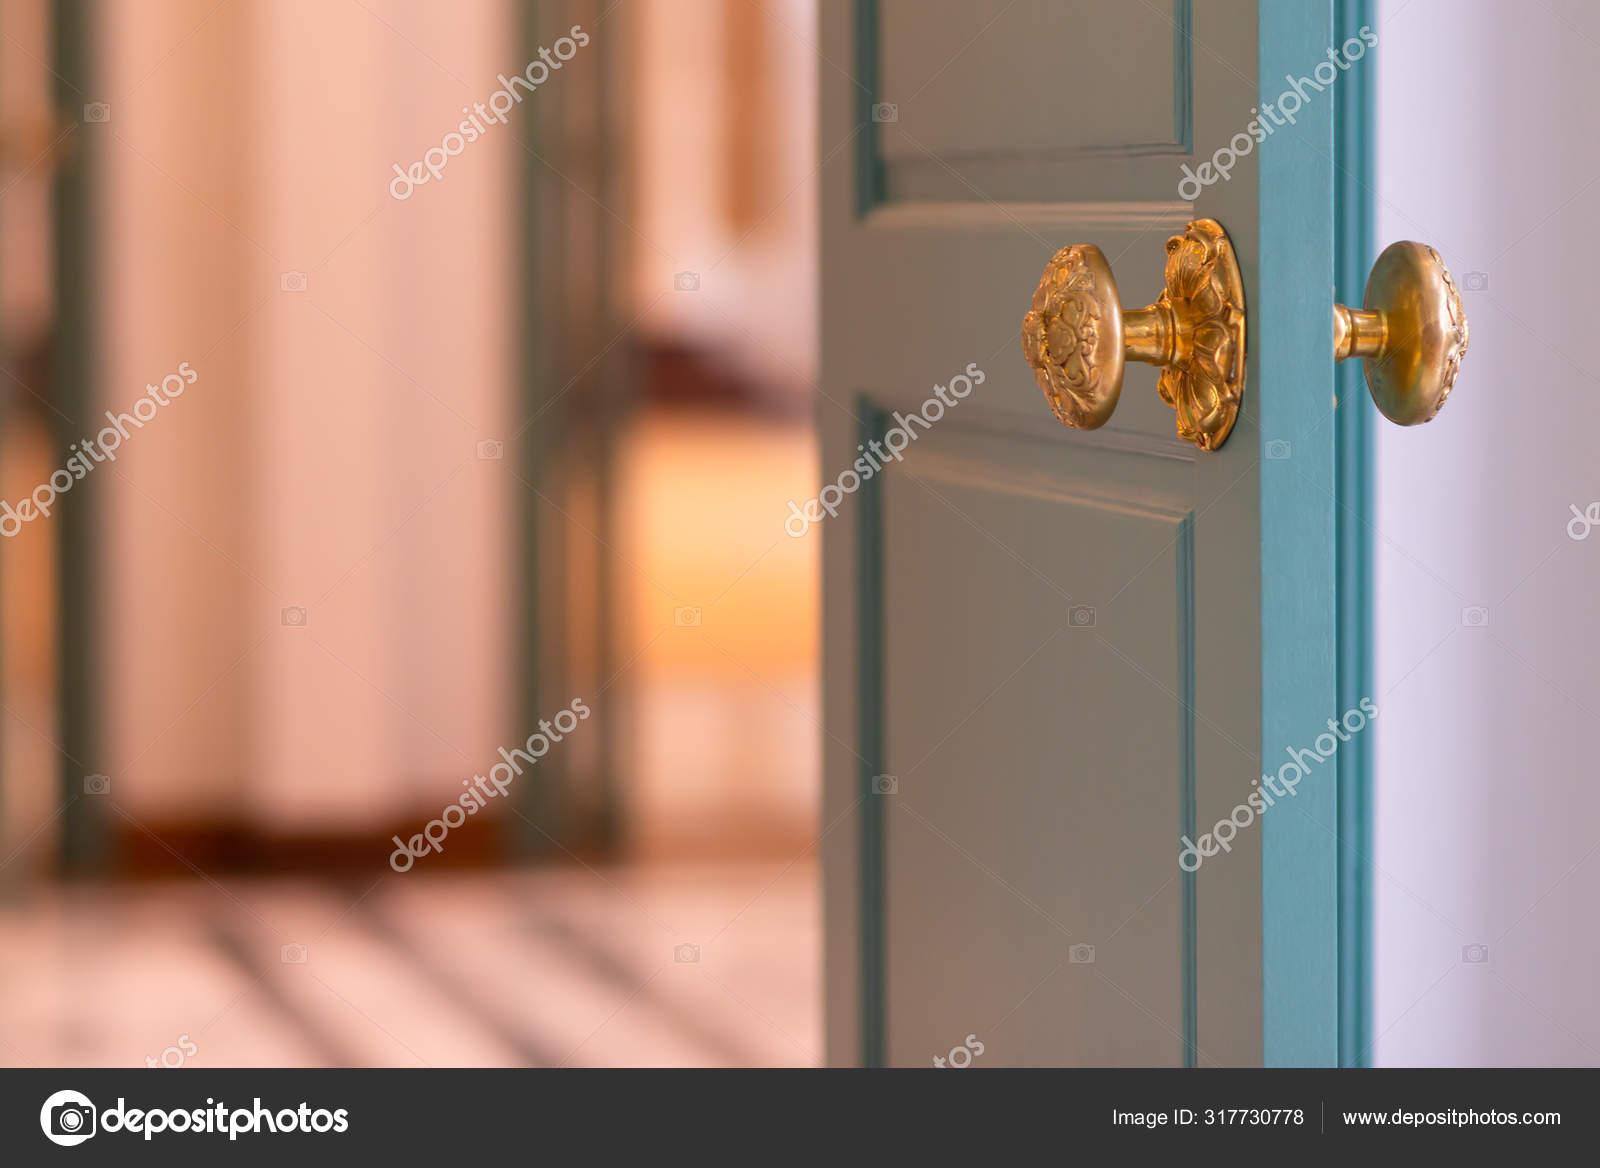 Classic Retro Brass Door Knob Green Door Vintage Decoration Retro Stock Photo C Pomphotothailand Gmail Com 317730778